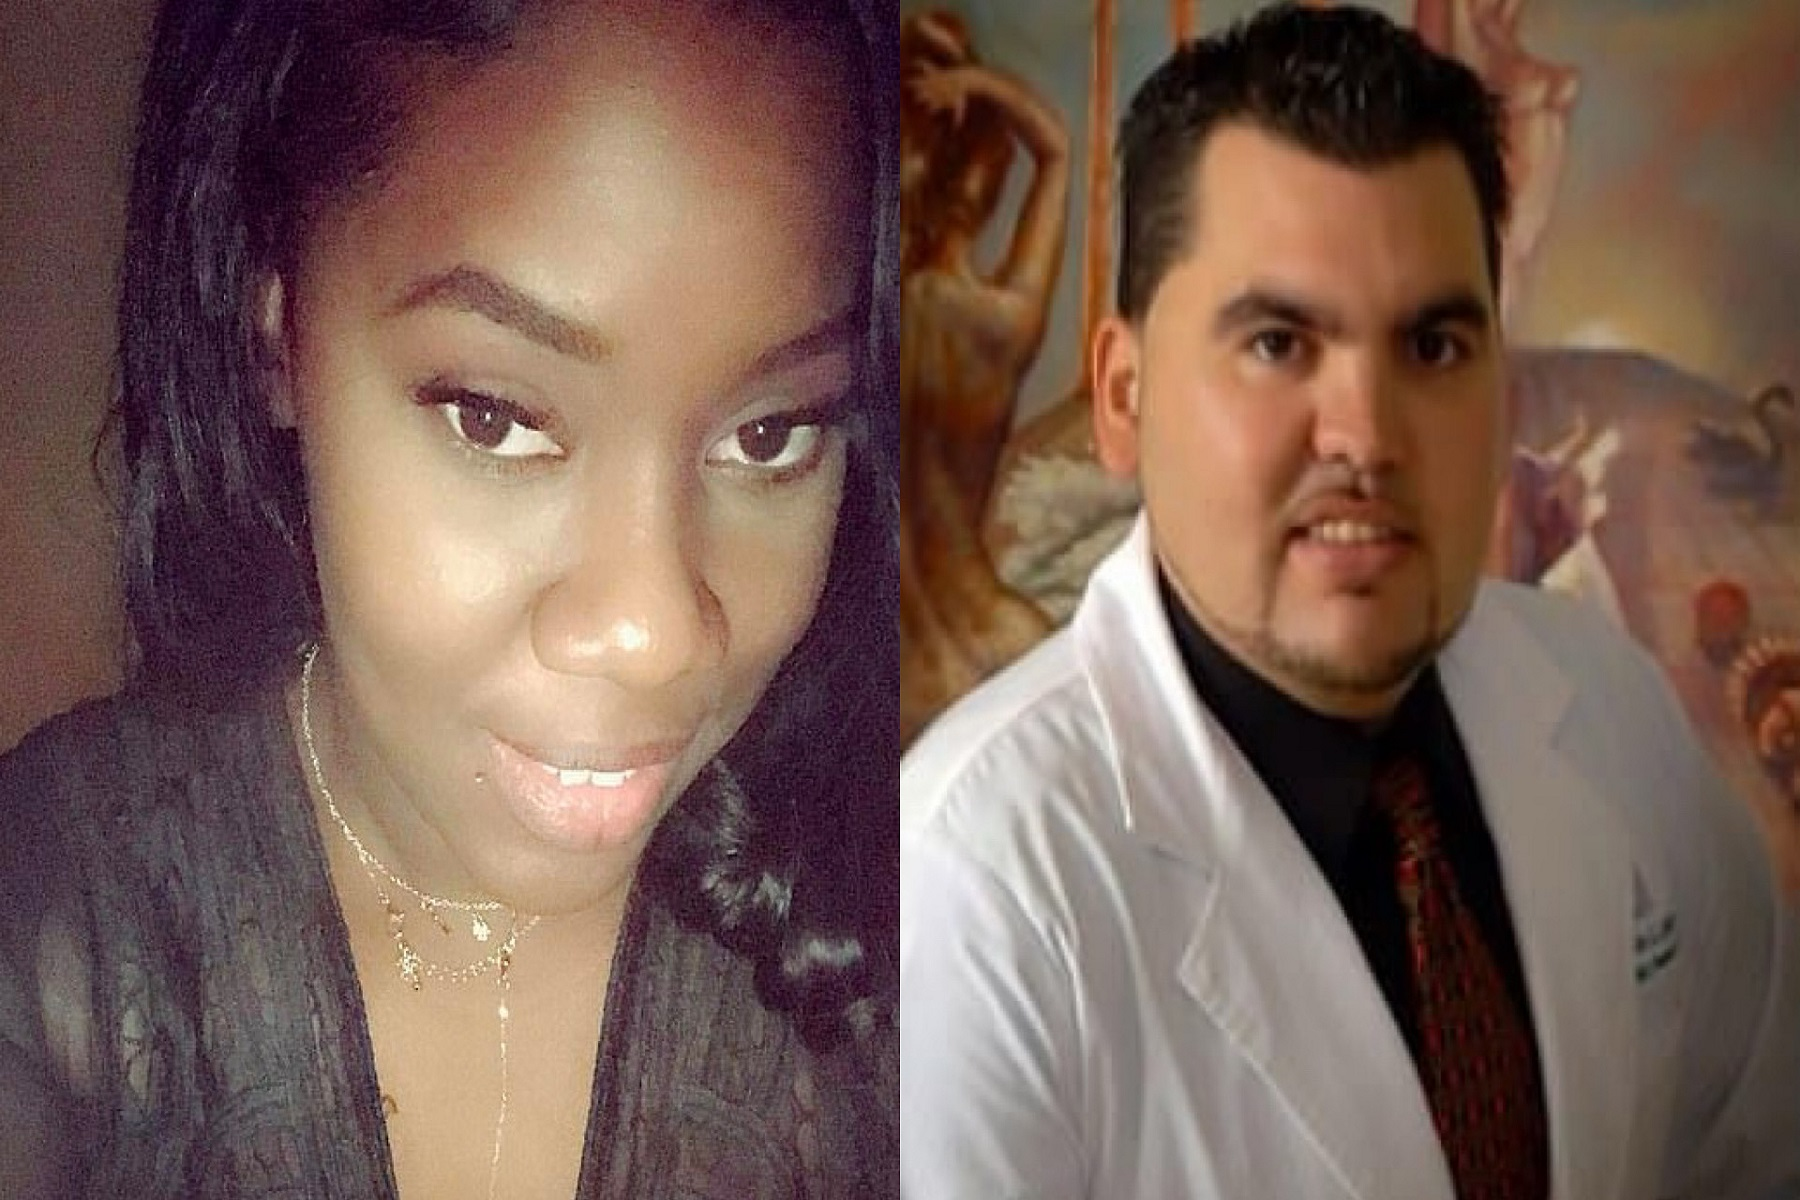 CDC Οδηγίες: Μοιραία απέβη χειρουργική επέμβαση απώλειας βάρους στο Μεξικό γυναίκας από την Αριζόνα